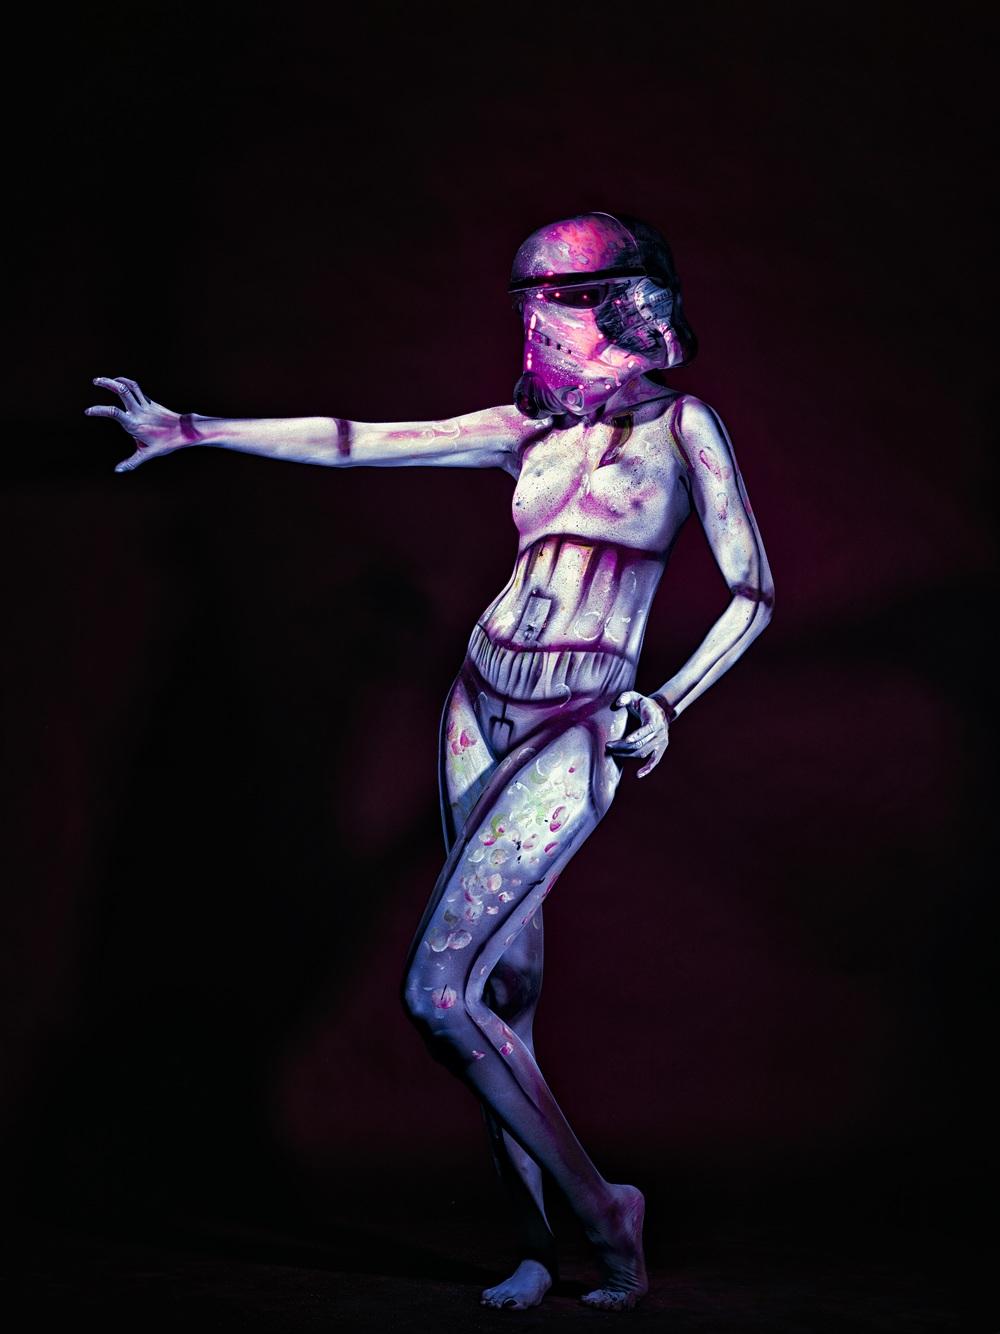 body paint: storm trooper cosplay